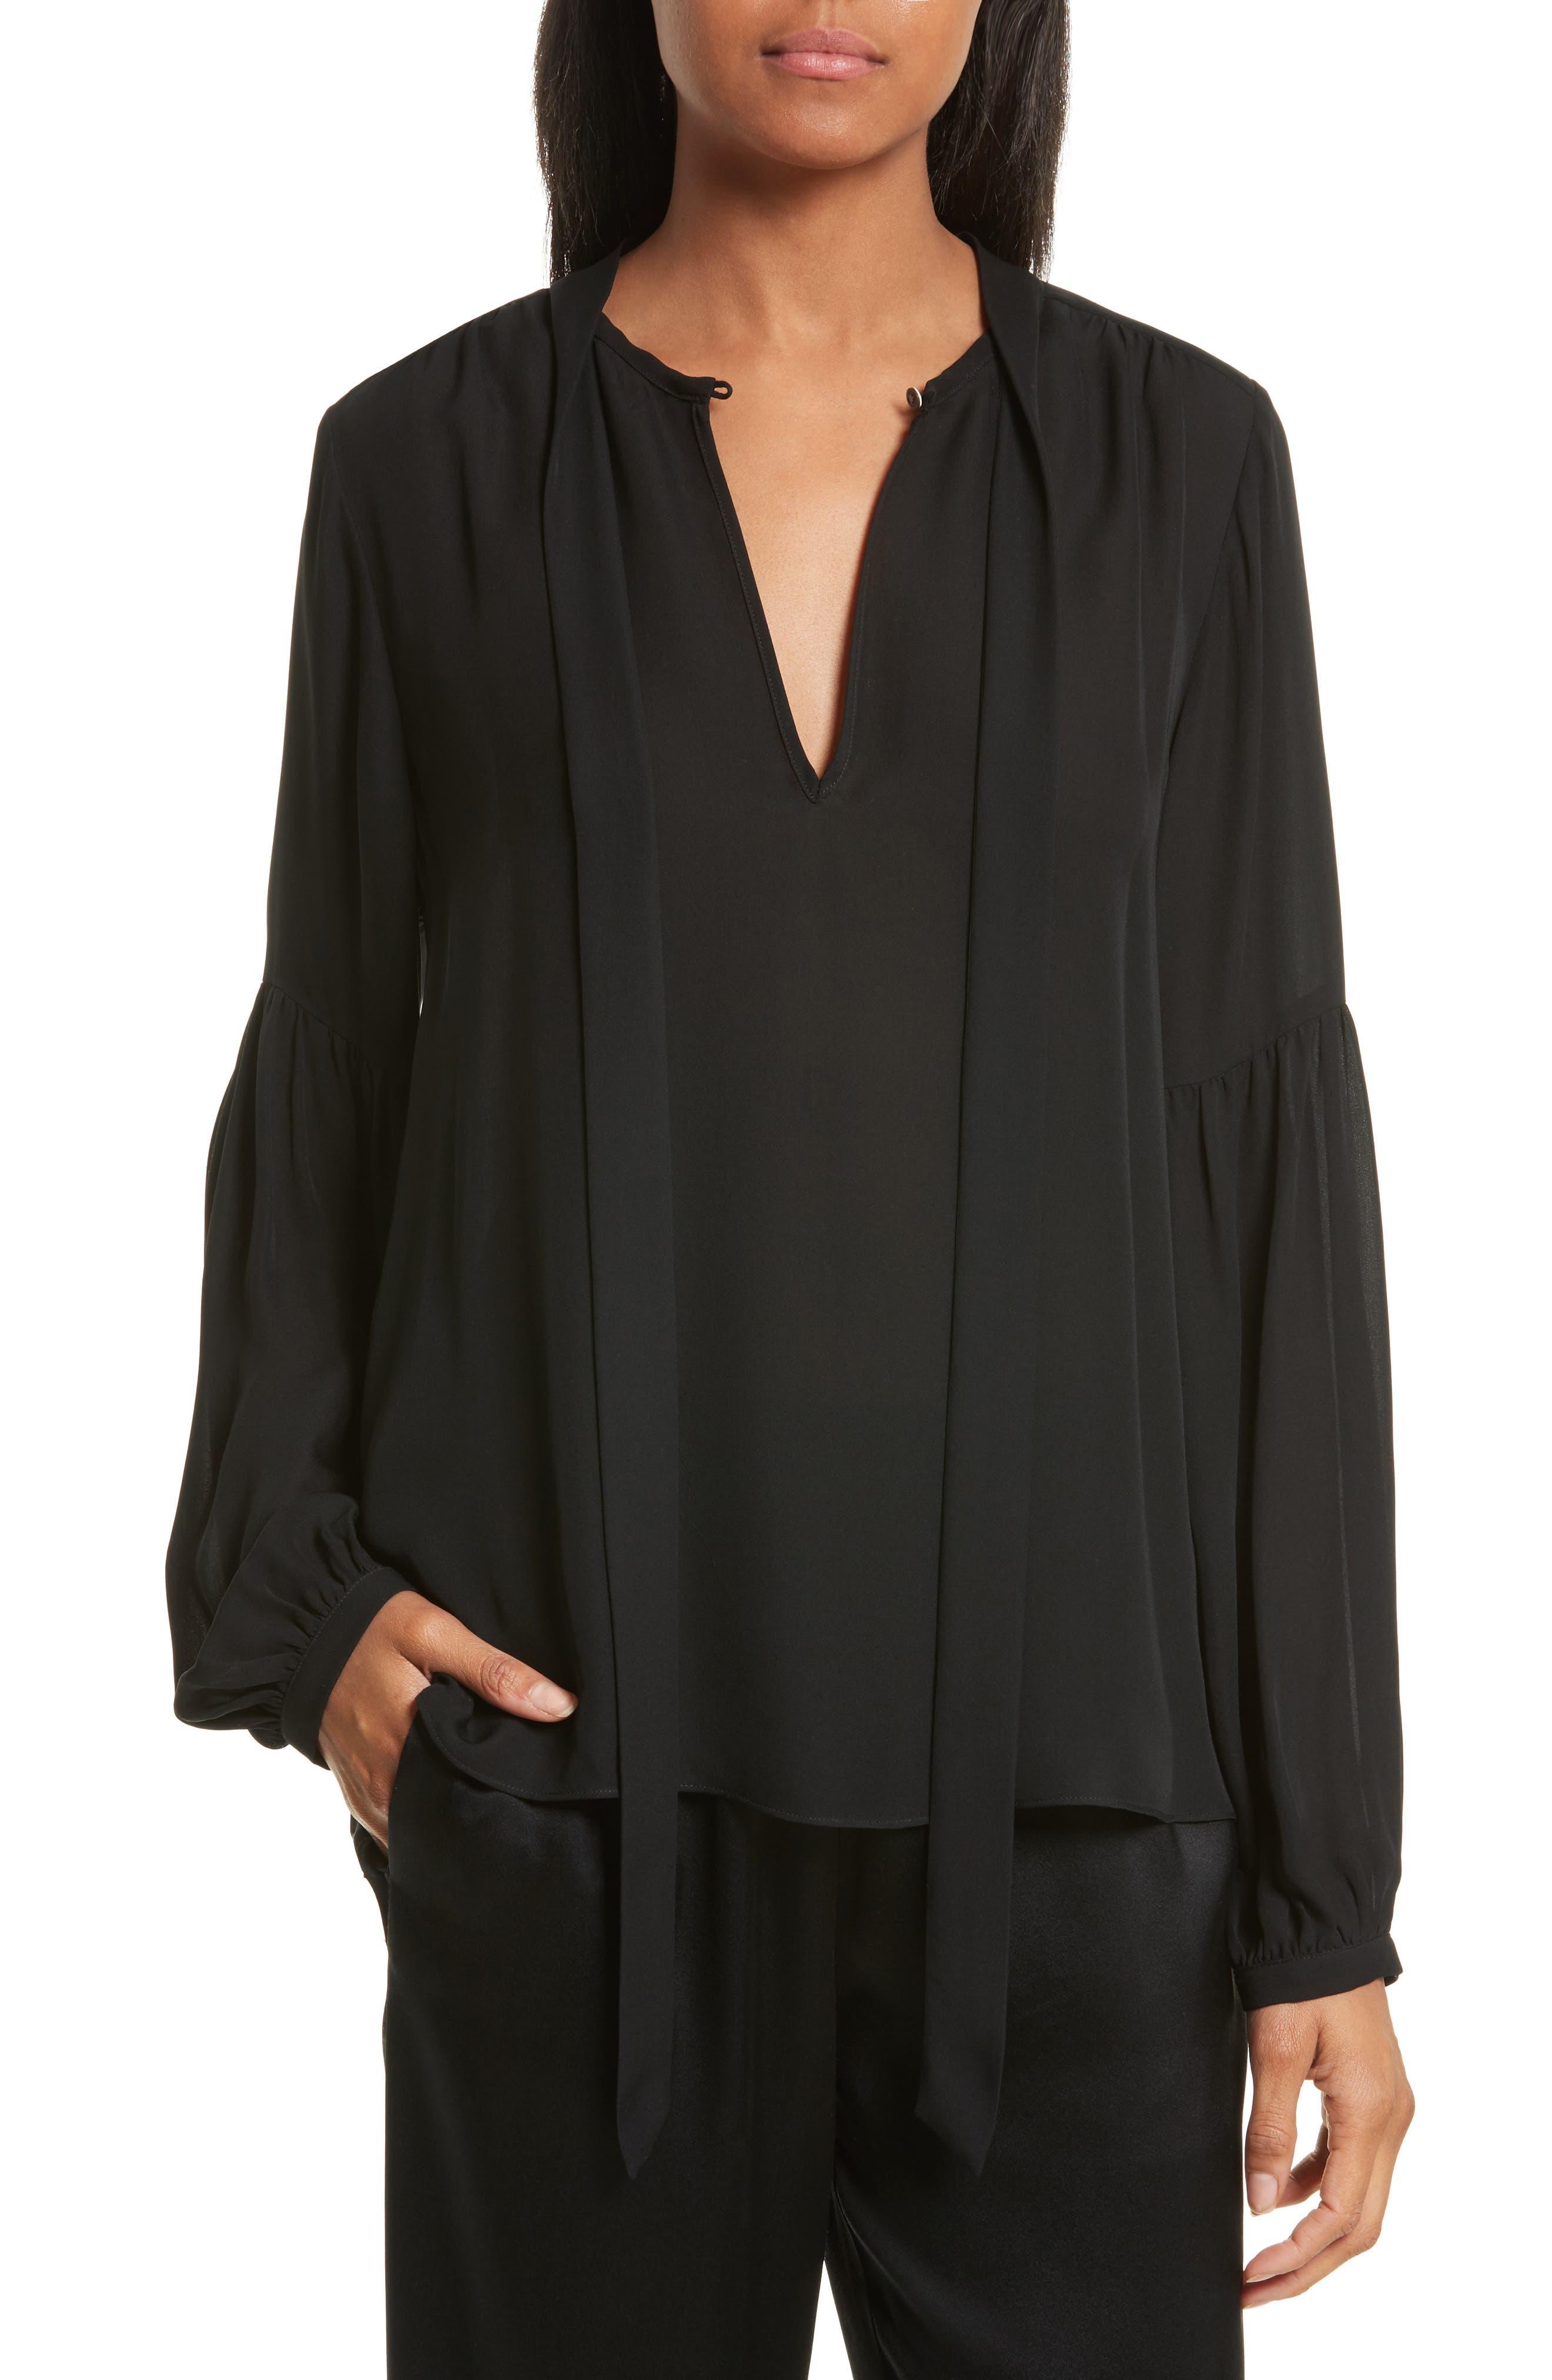 Alternate Image 1 Selected - Nili Lotan Abbeline Tie Neck Silk Georgette Top